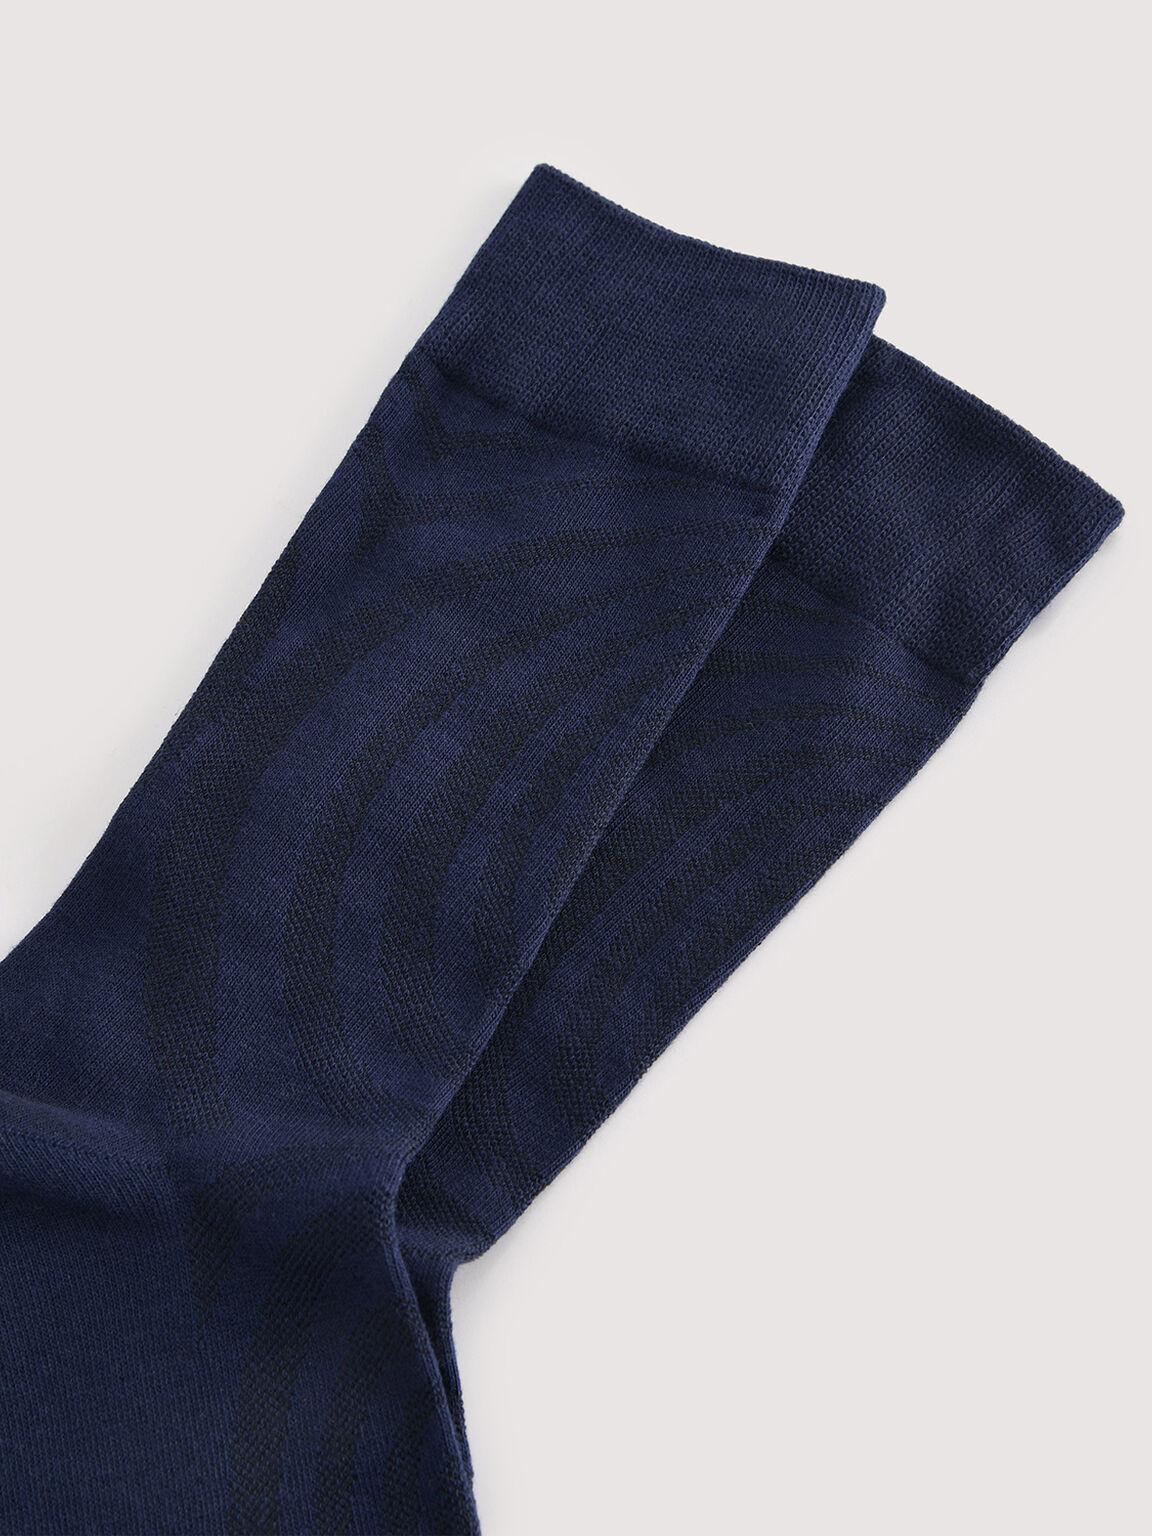 3-pack of Cotton Socks, Multi, hi-res